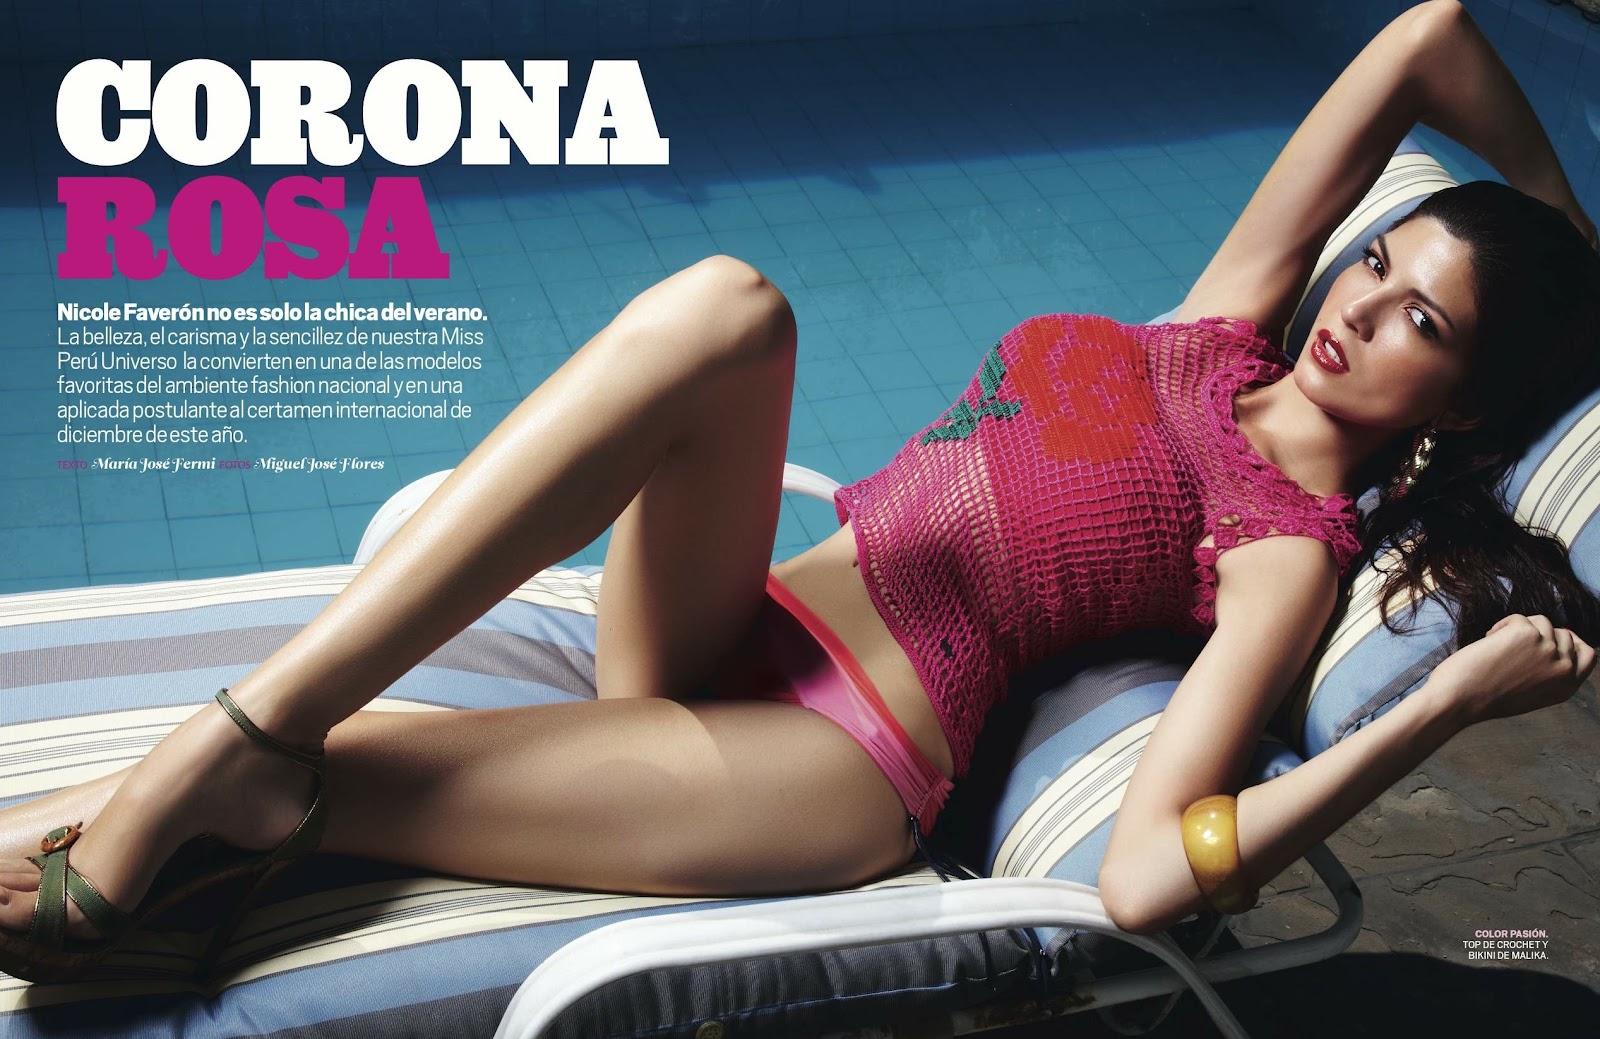 nicole faveron, semifinalista de miss  universe 2012. - Página 2 Uoiqvopu